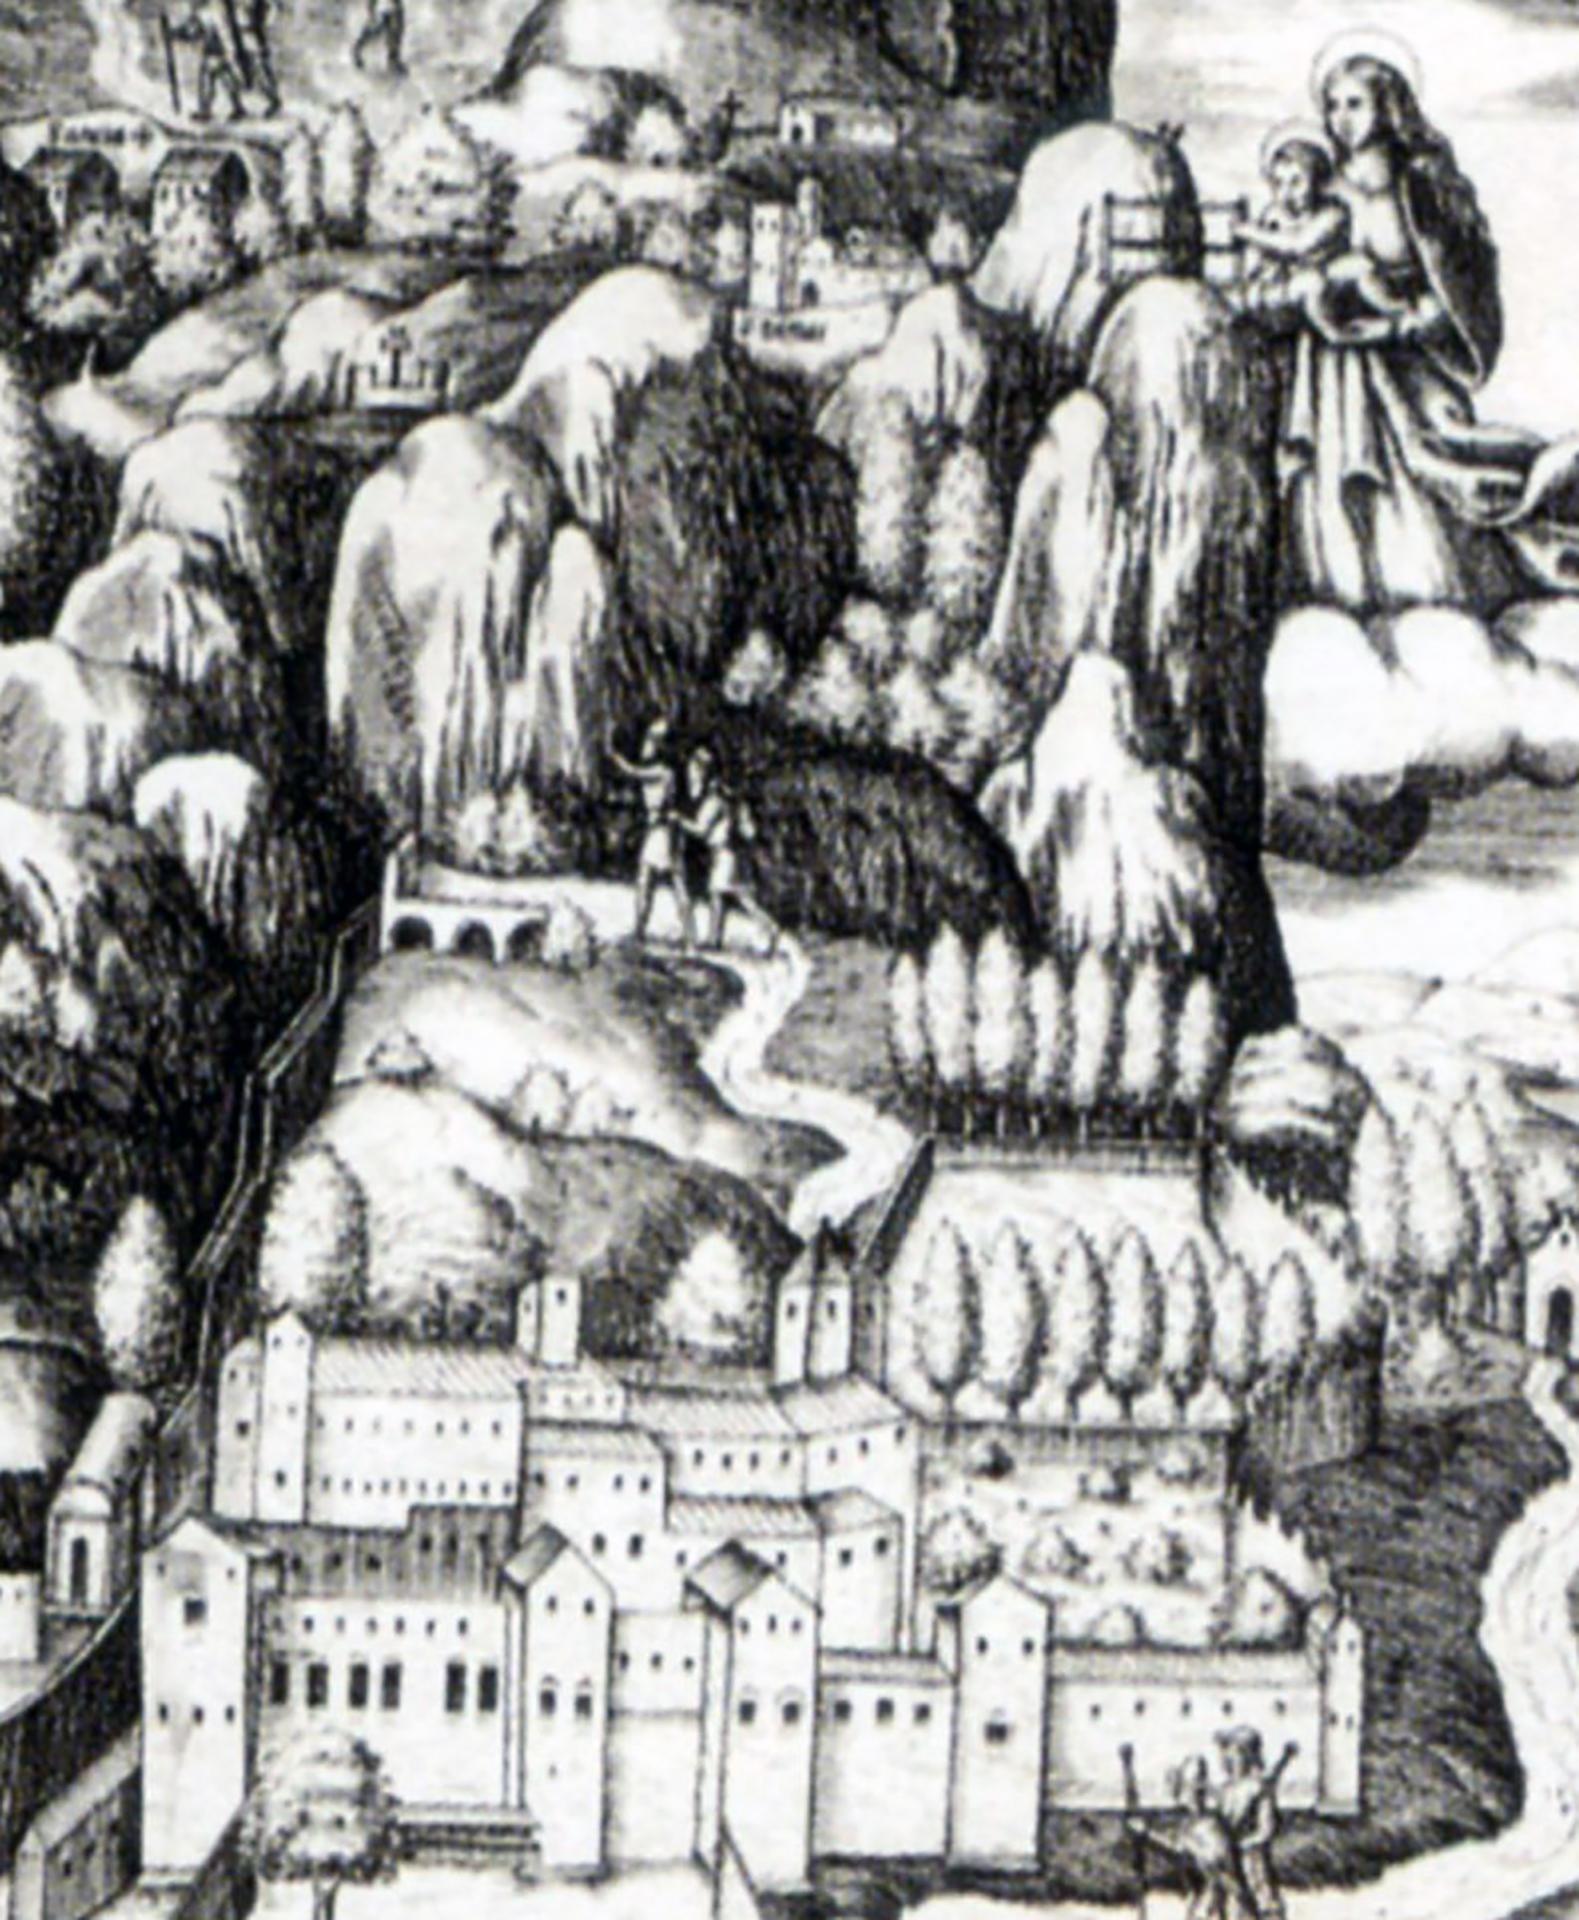 3 Montserrat gravat al buri 1572 Nigra sum p 91 detall 1579x1920